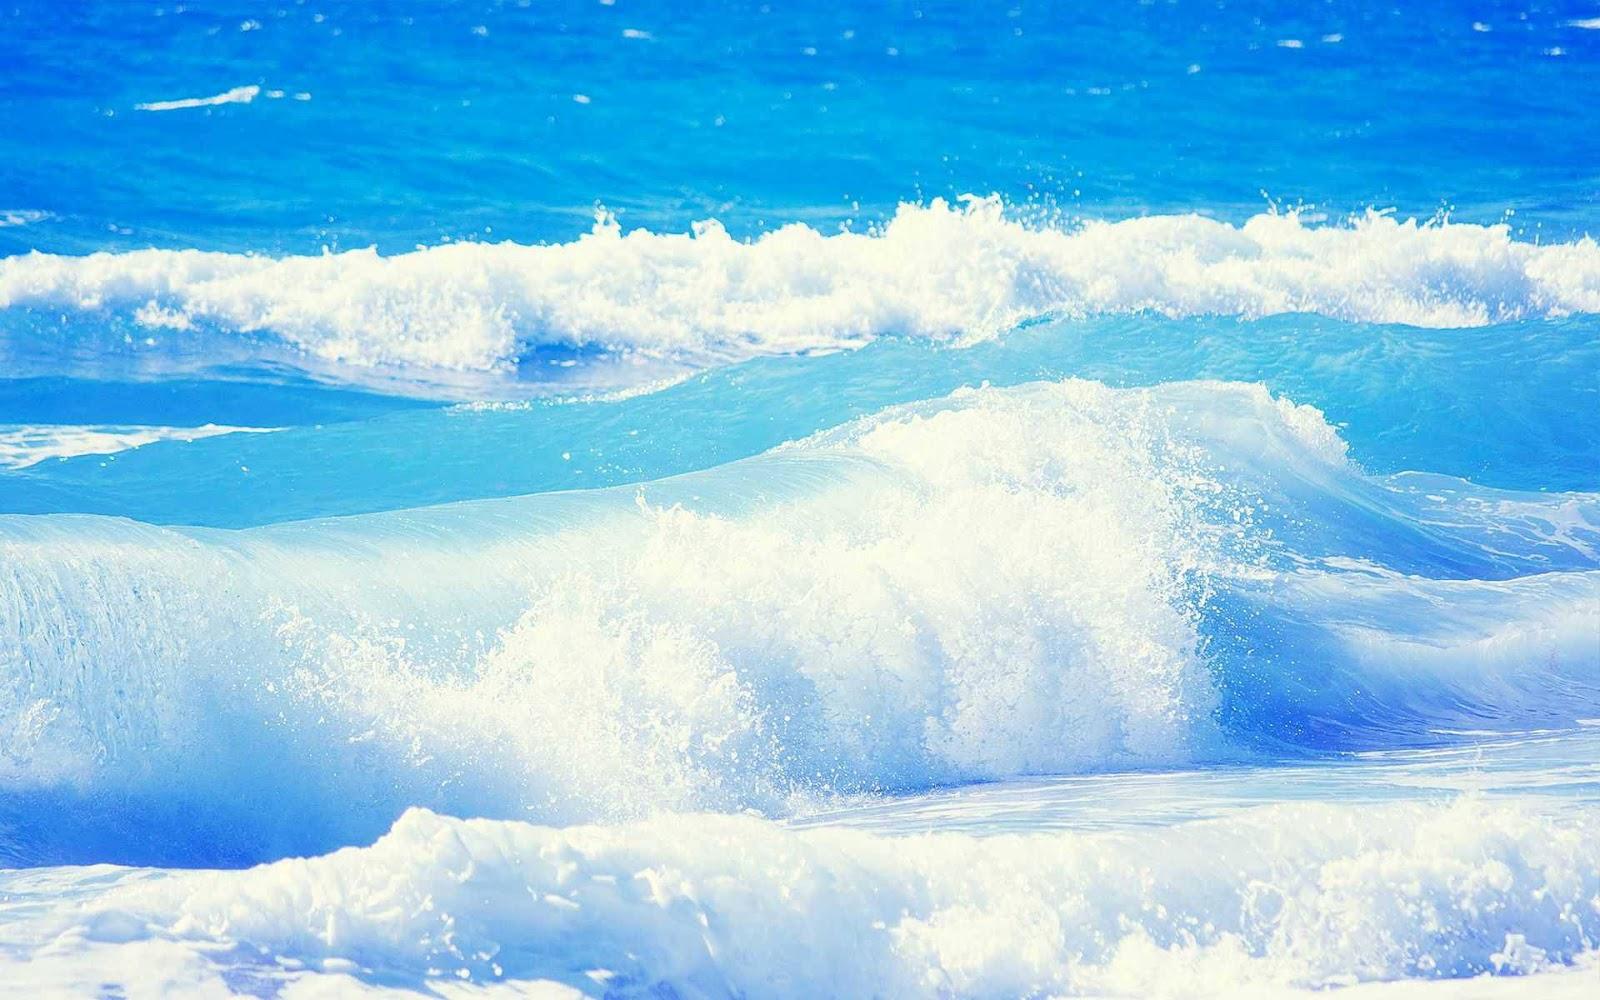 Sea Waves Hd Wallpapers | Free HD Wallpapers